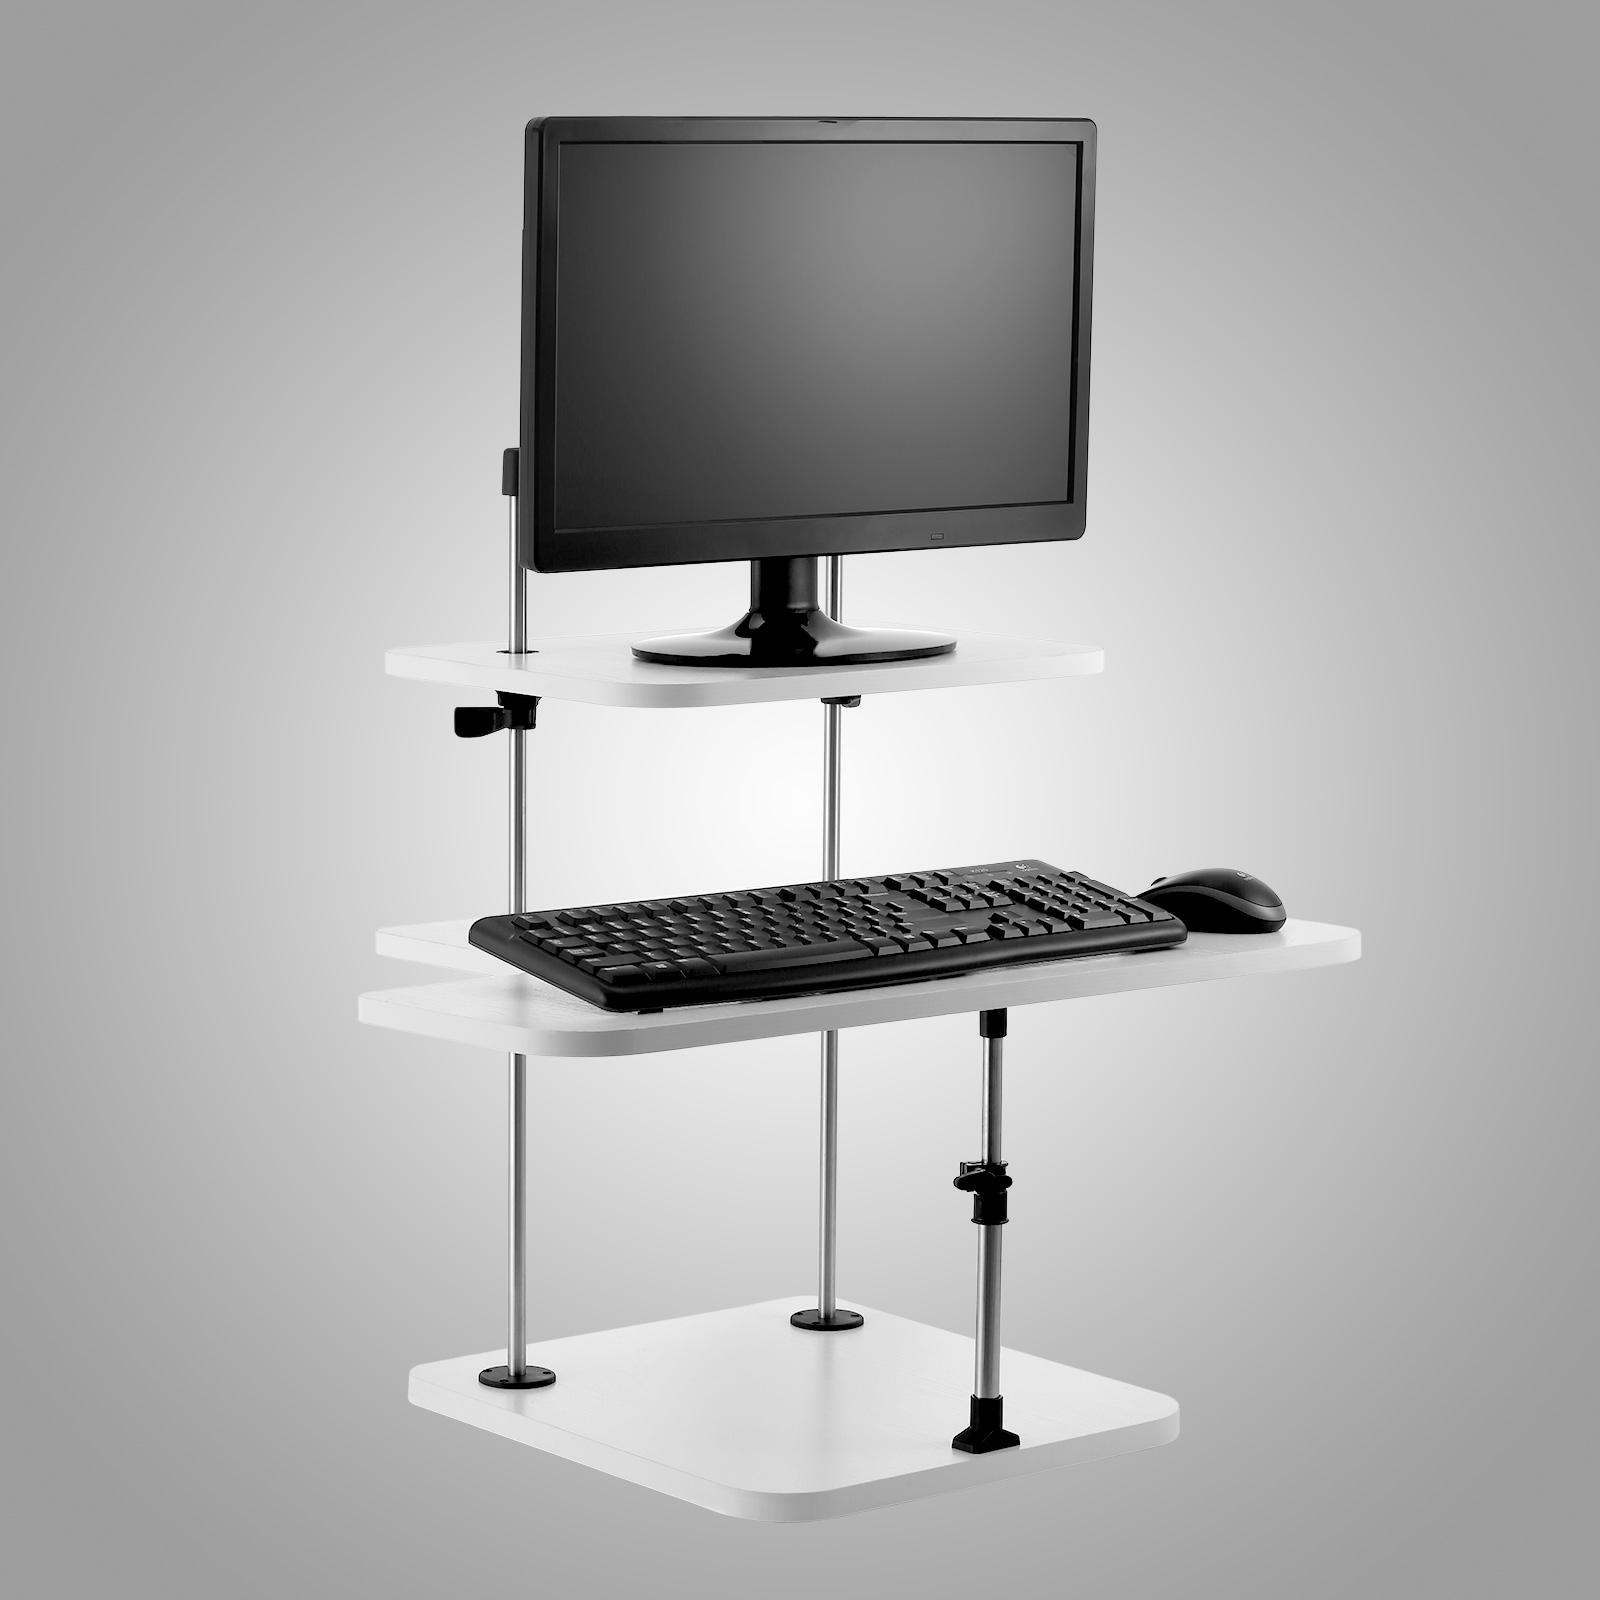 3 tier adjustable computer standing desk light weight home for Home office standing desk